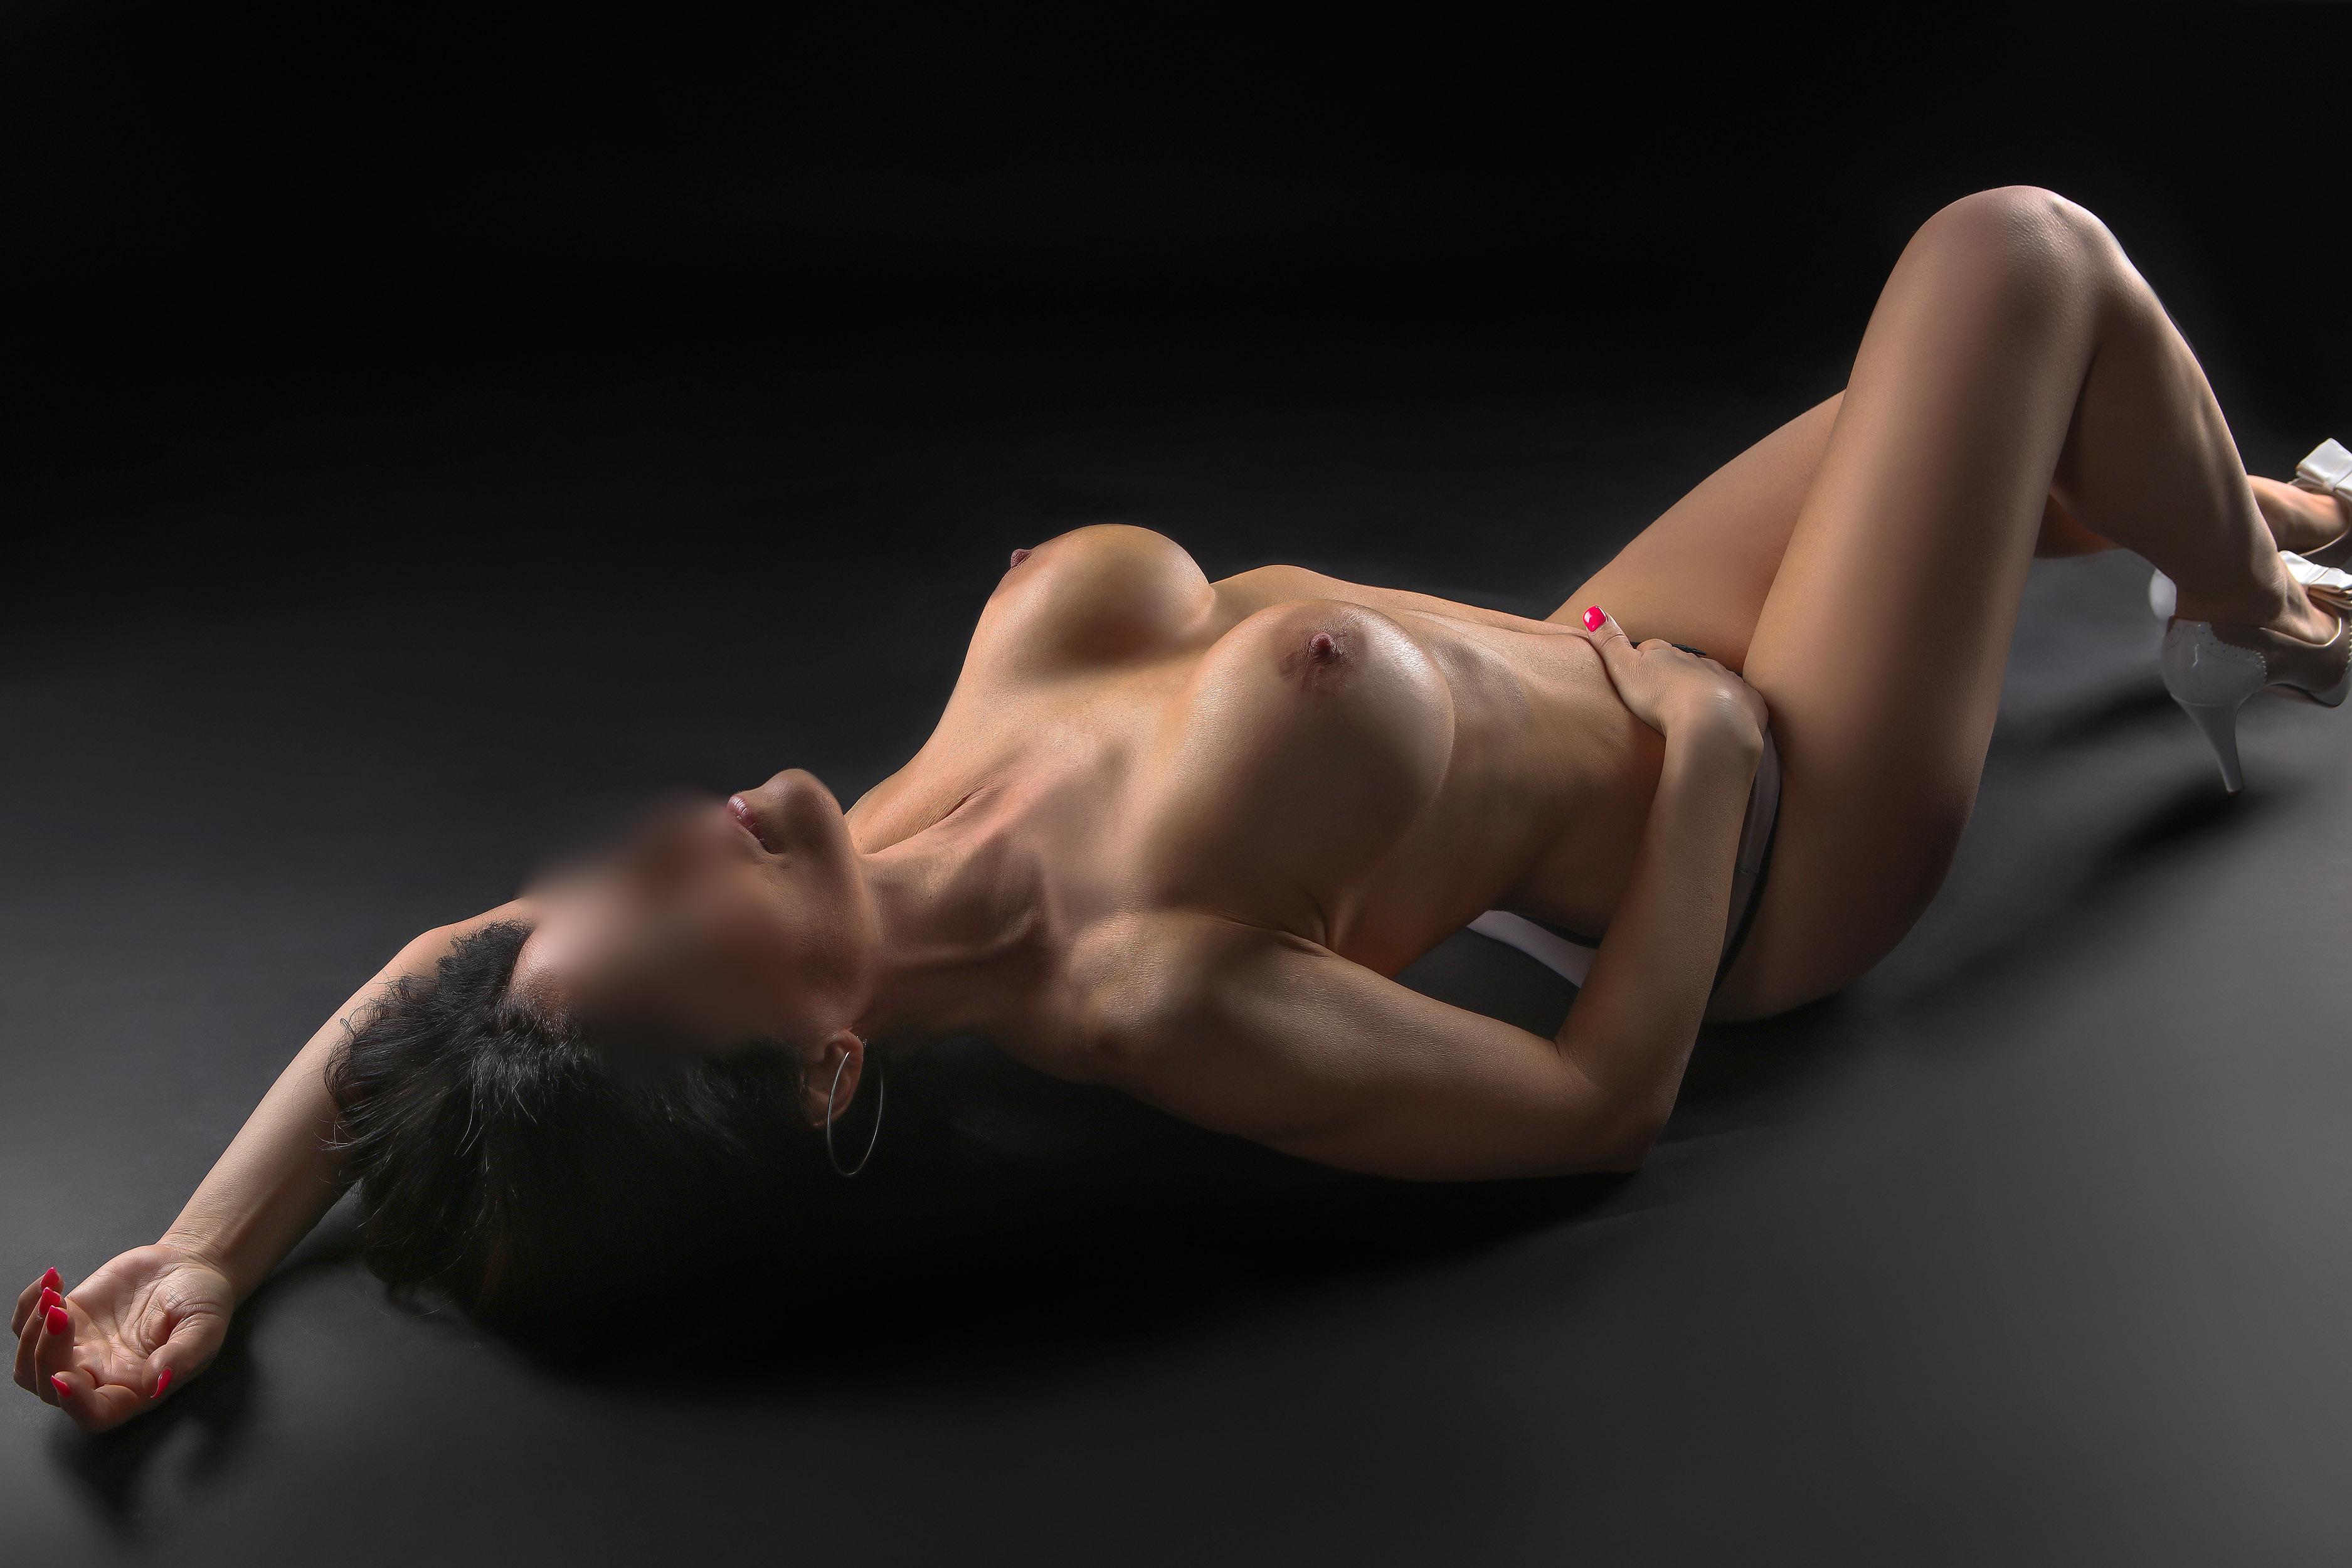 milena-05-escorte-girl-monaco-suisse-geneva-agence.jpg